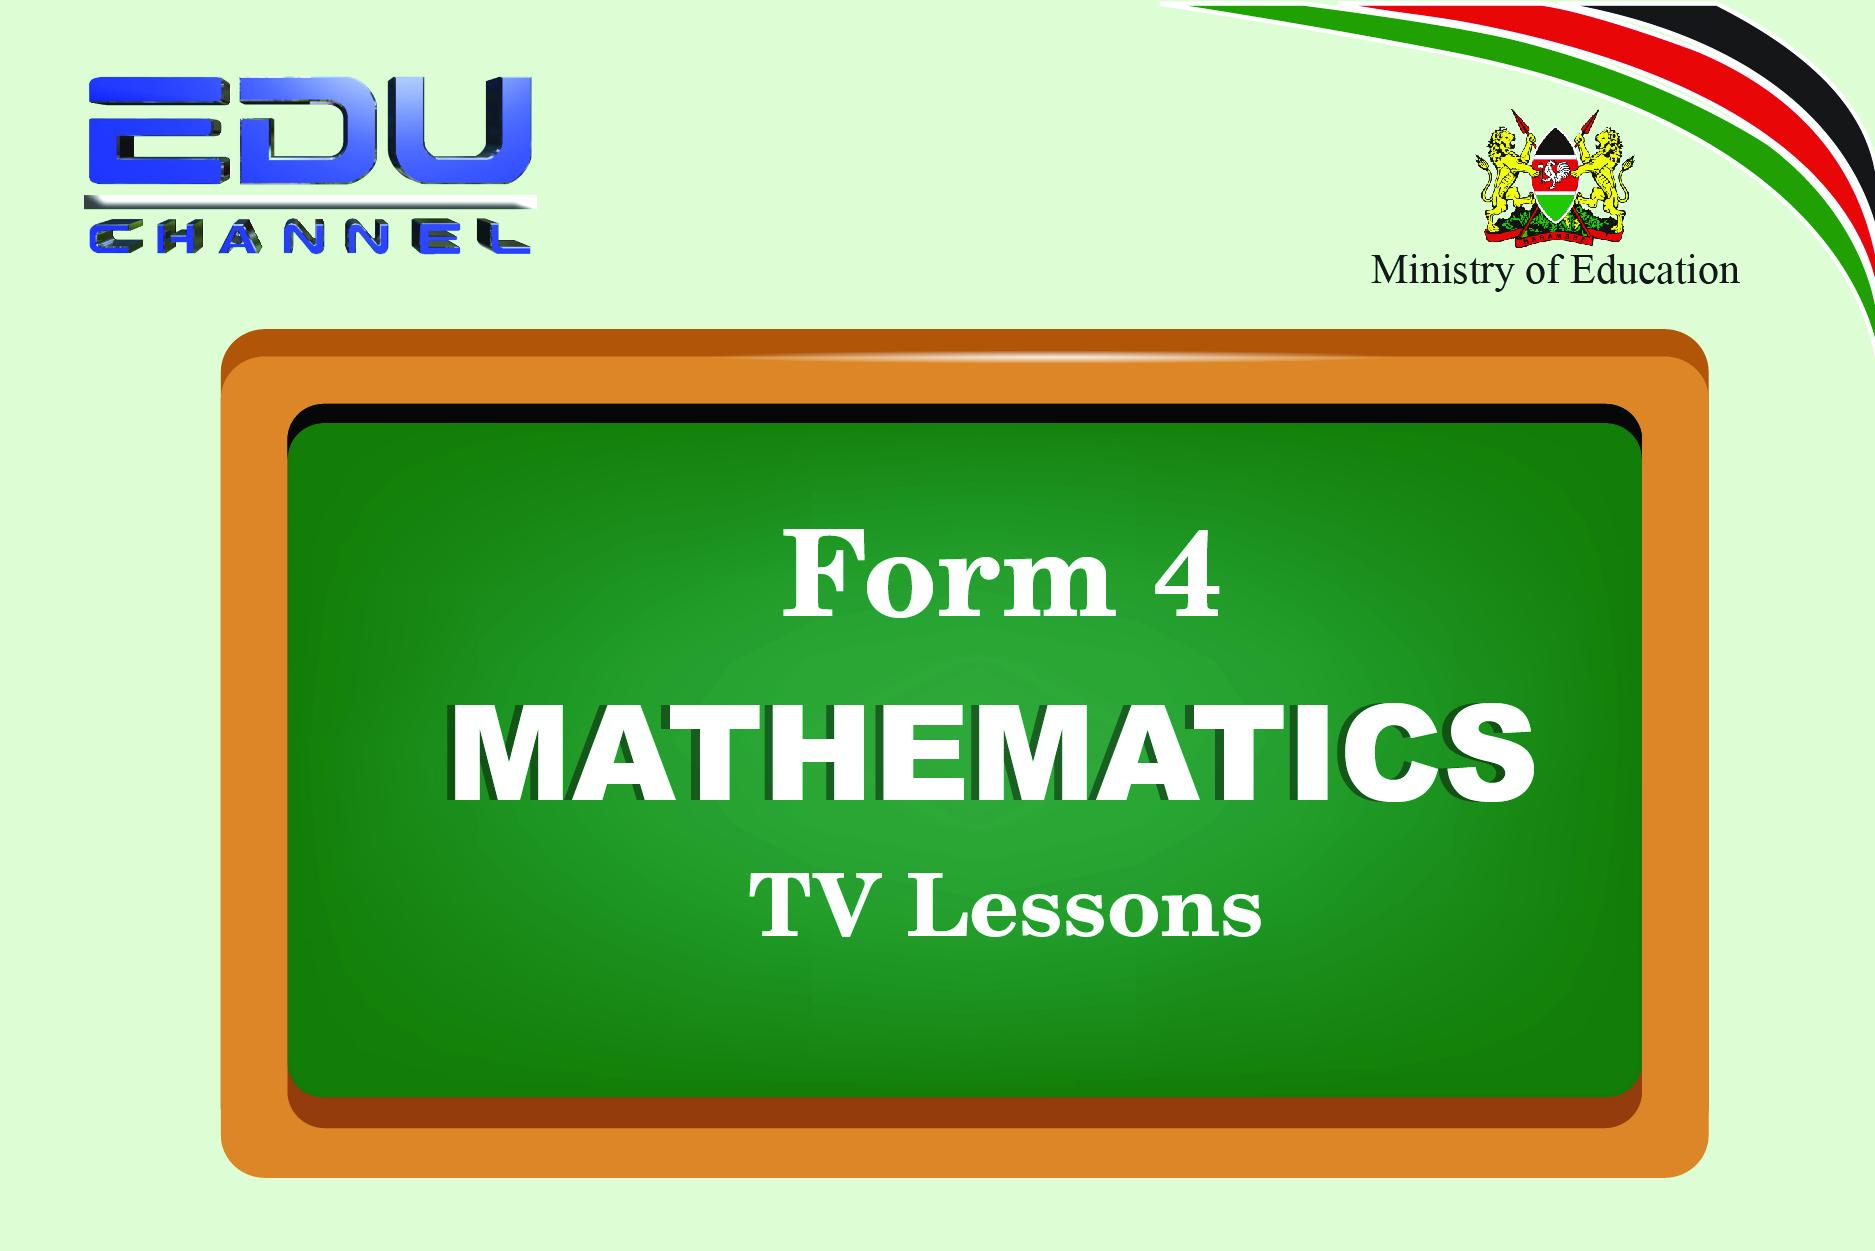 Form 4 Mathematics Lesson 8: Distance - Longitude and Latitude